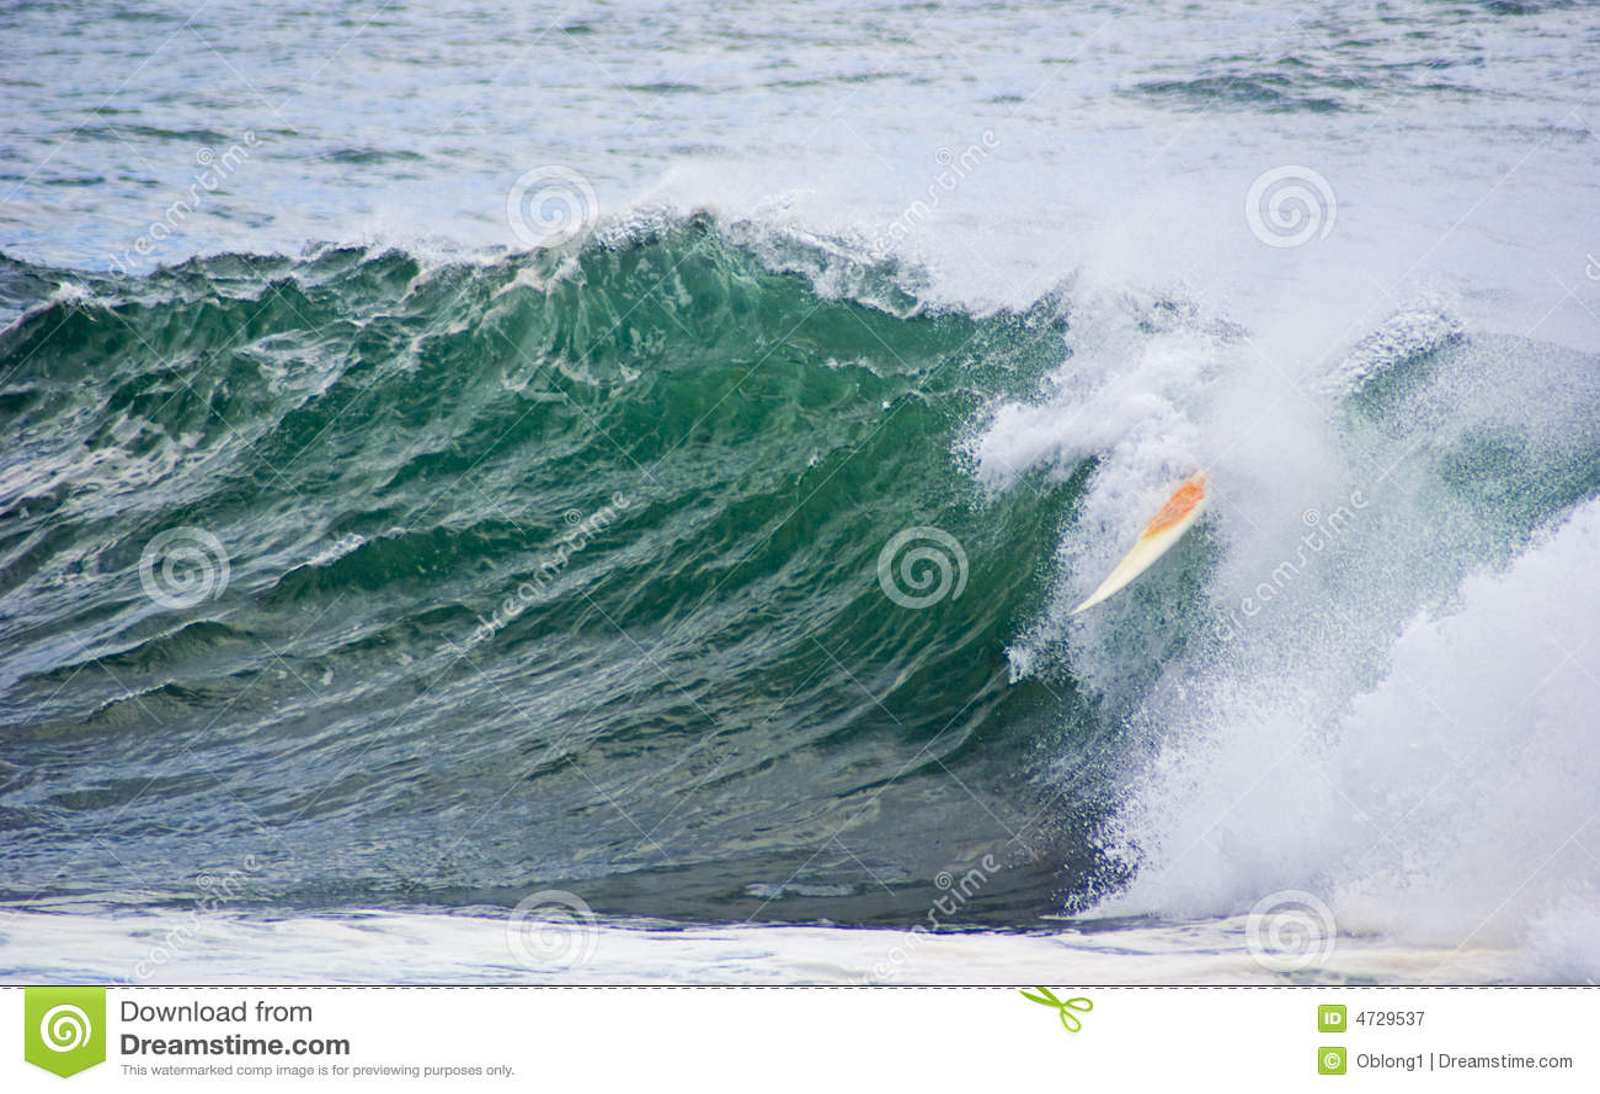 Surfboard dumped surf wave